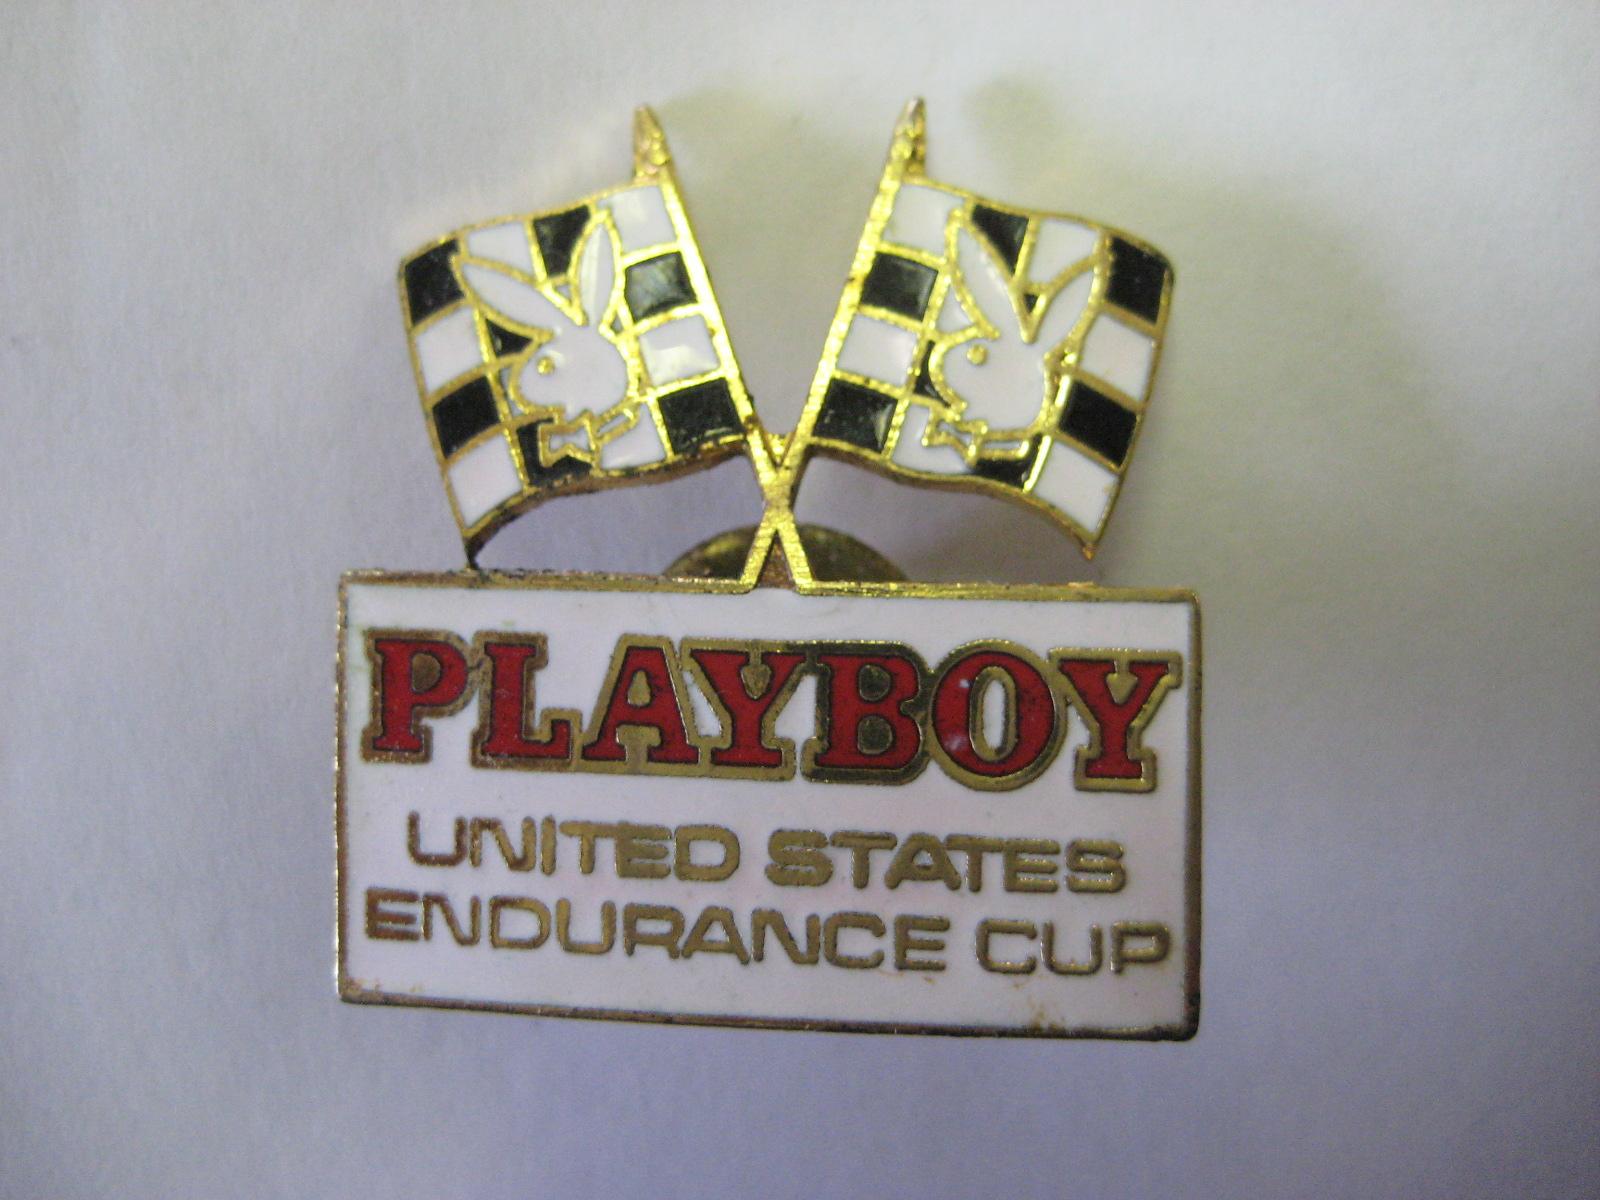 Playboy Endurance Cup Hat Pin 1985